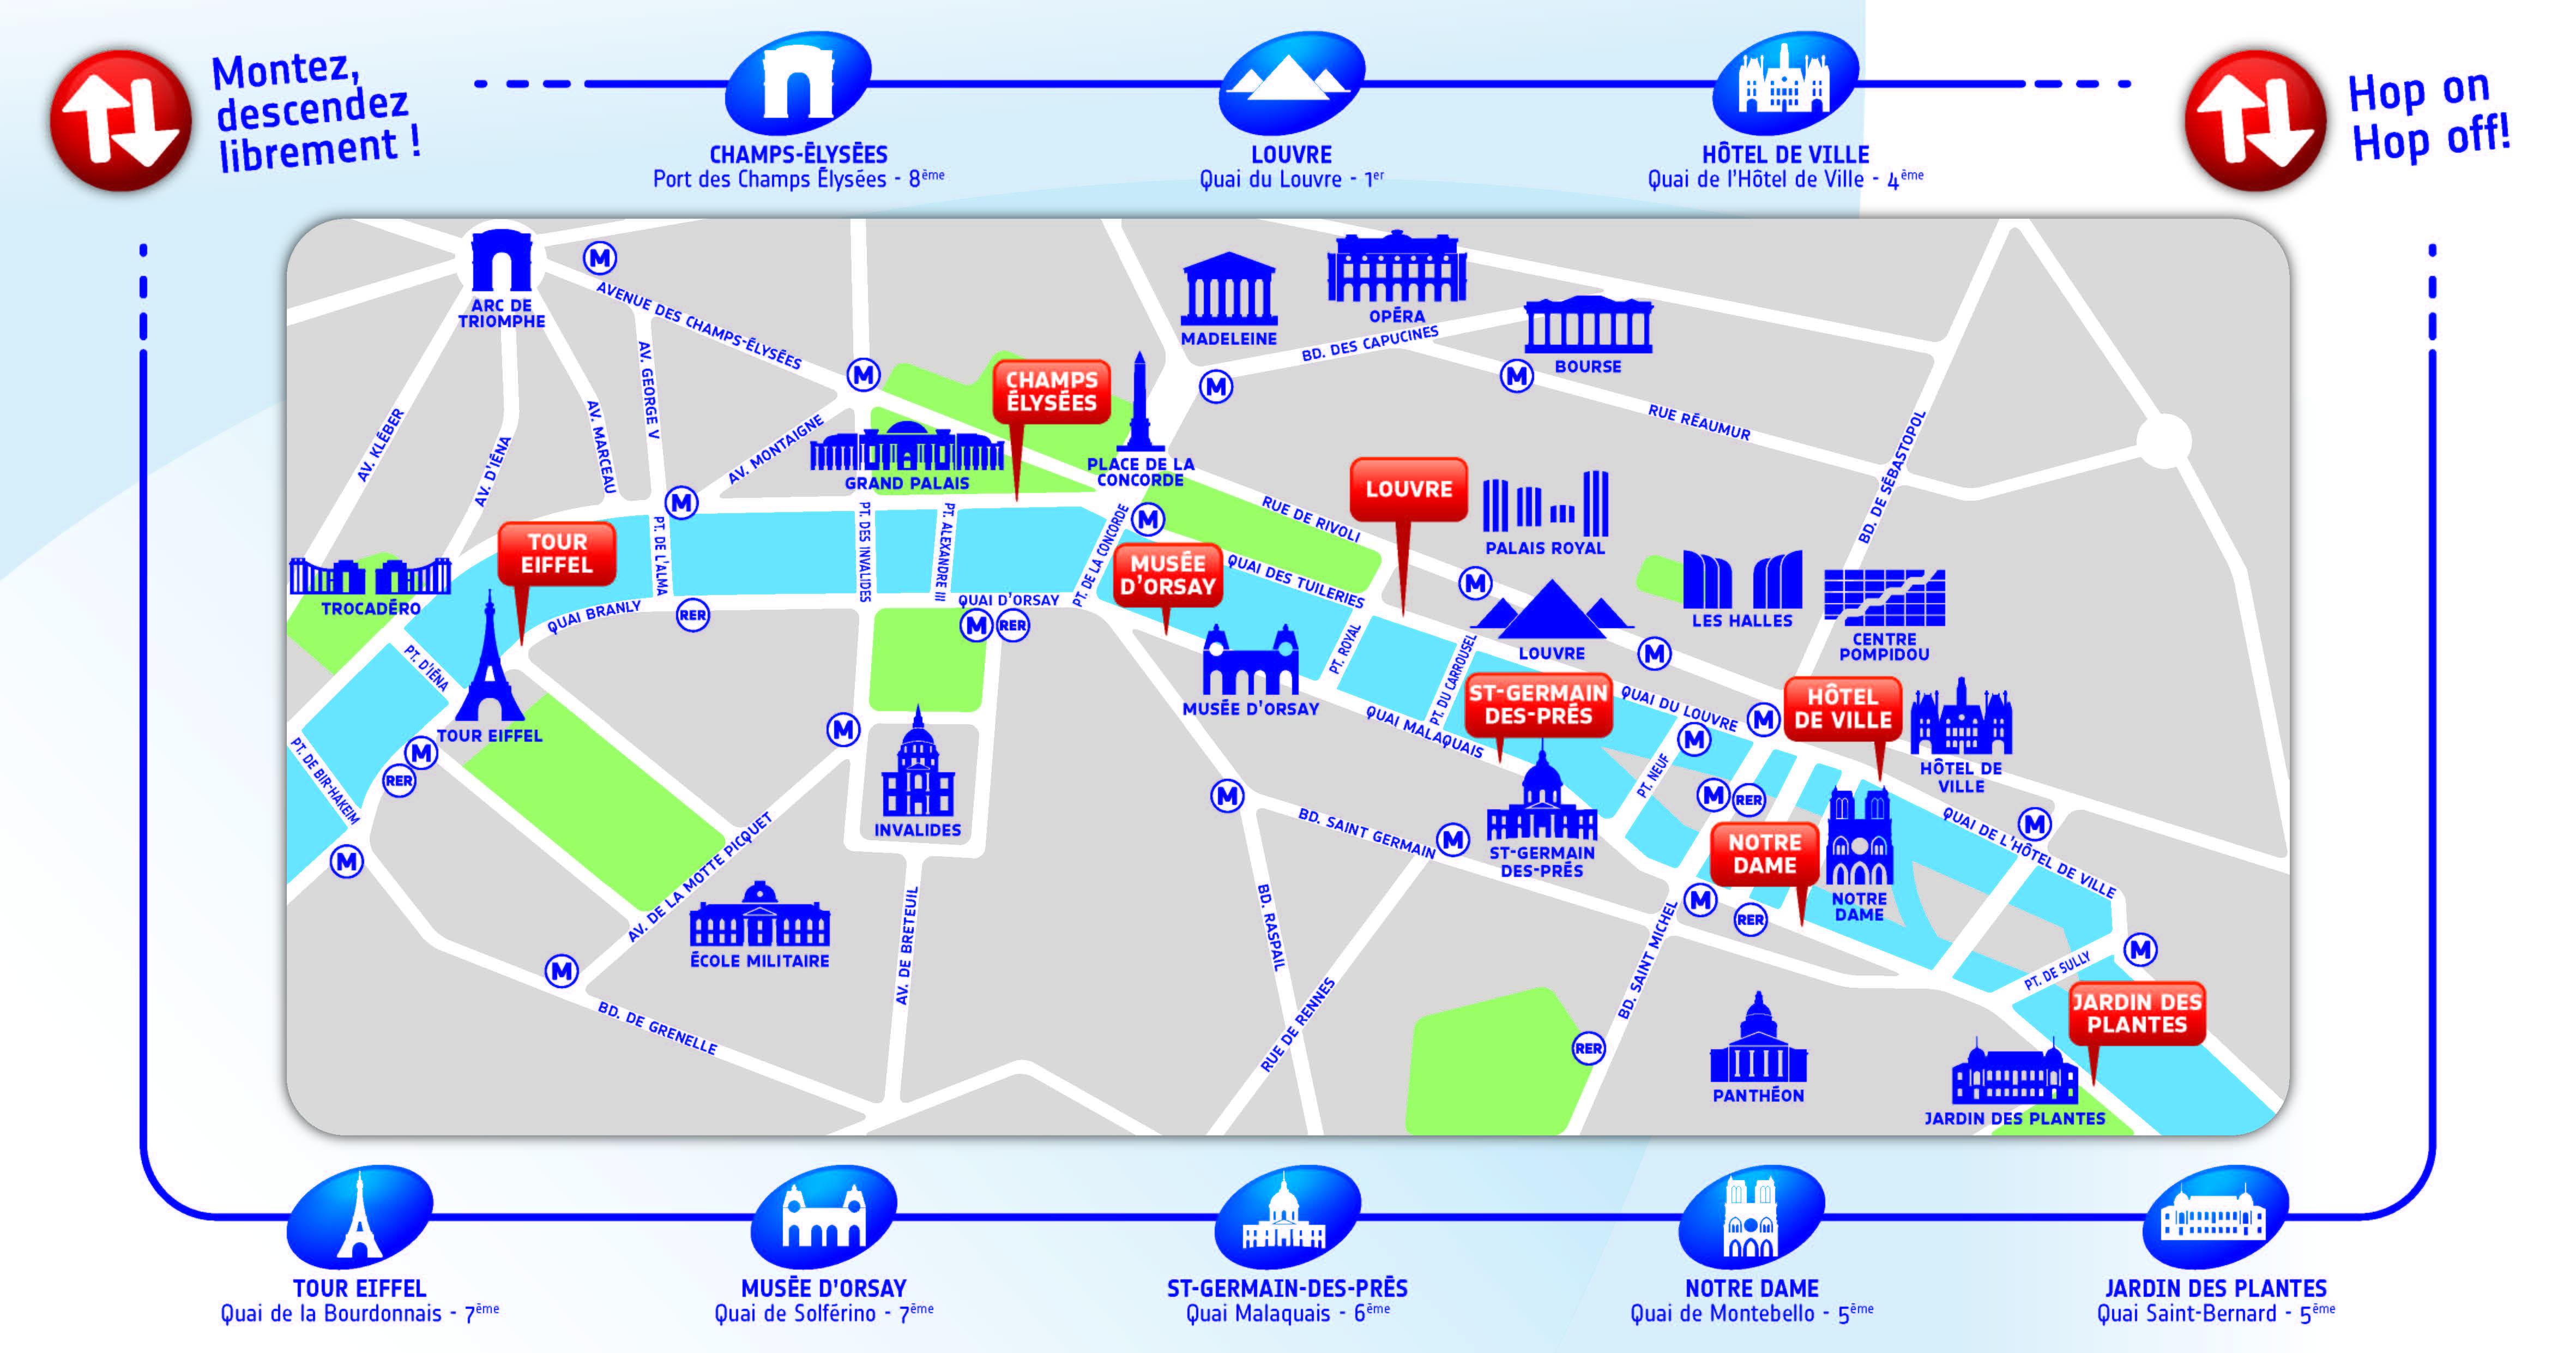 boston hop on off bus tour map with Paris Sightseeingtour Paris A La Carte on City sightseeing tour together with Map New York Tourist likewise Paris sightseeingtour paris a la carte besides 1483278 furthermore Edinburgh City Hop On Hop Off Tour.